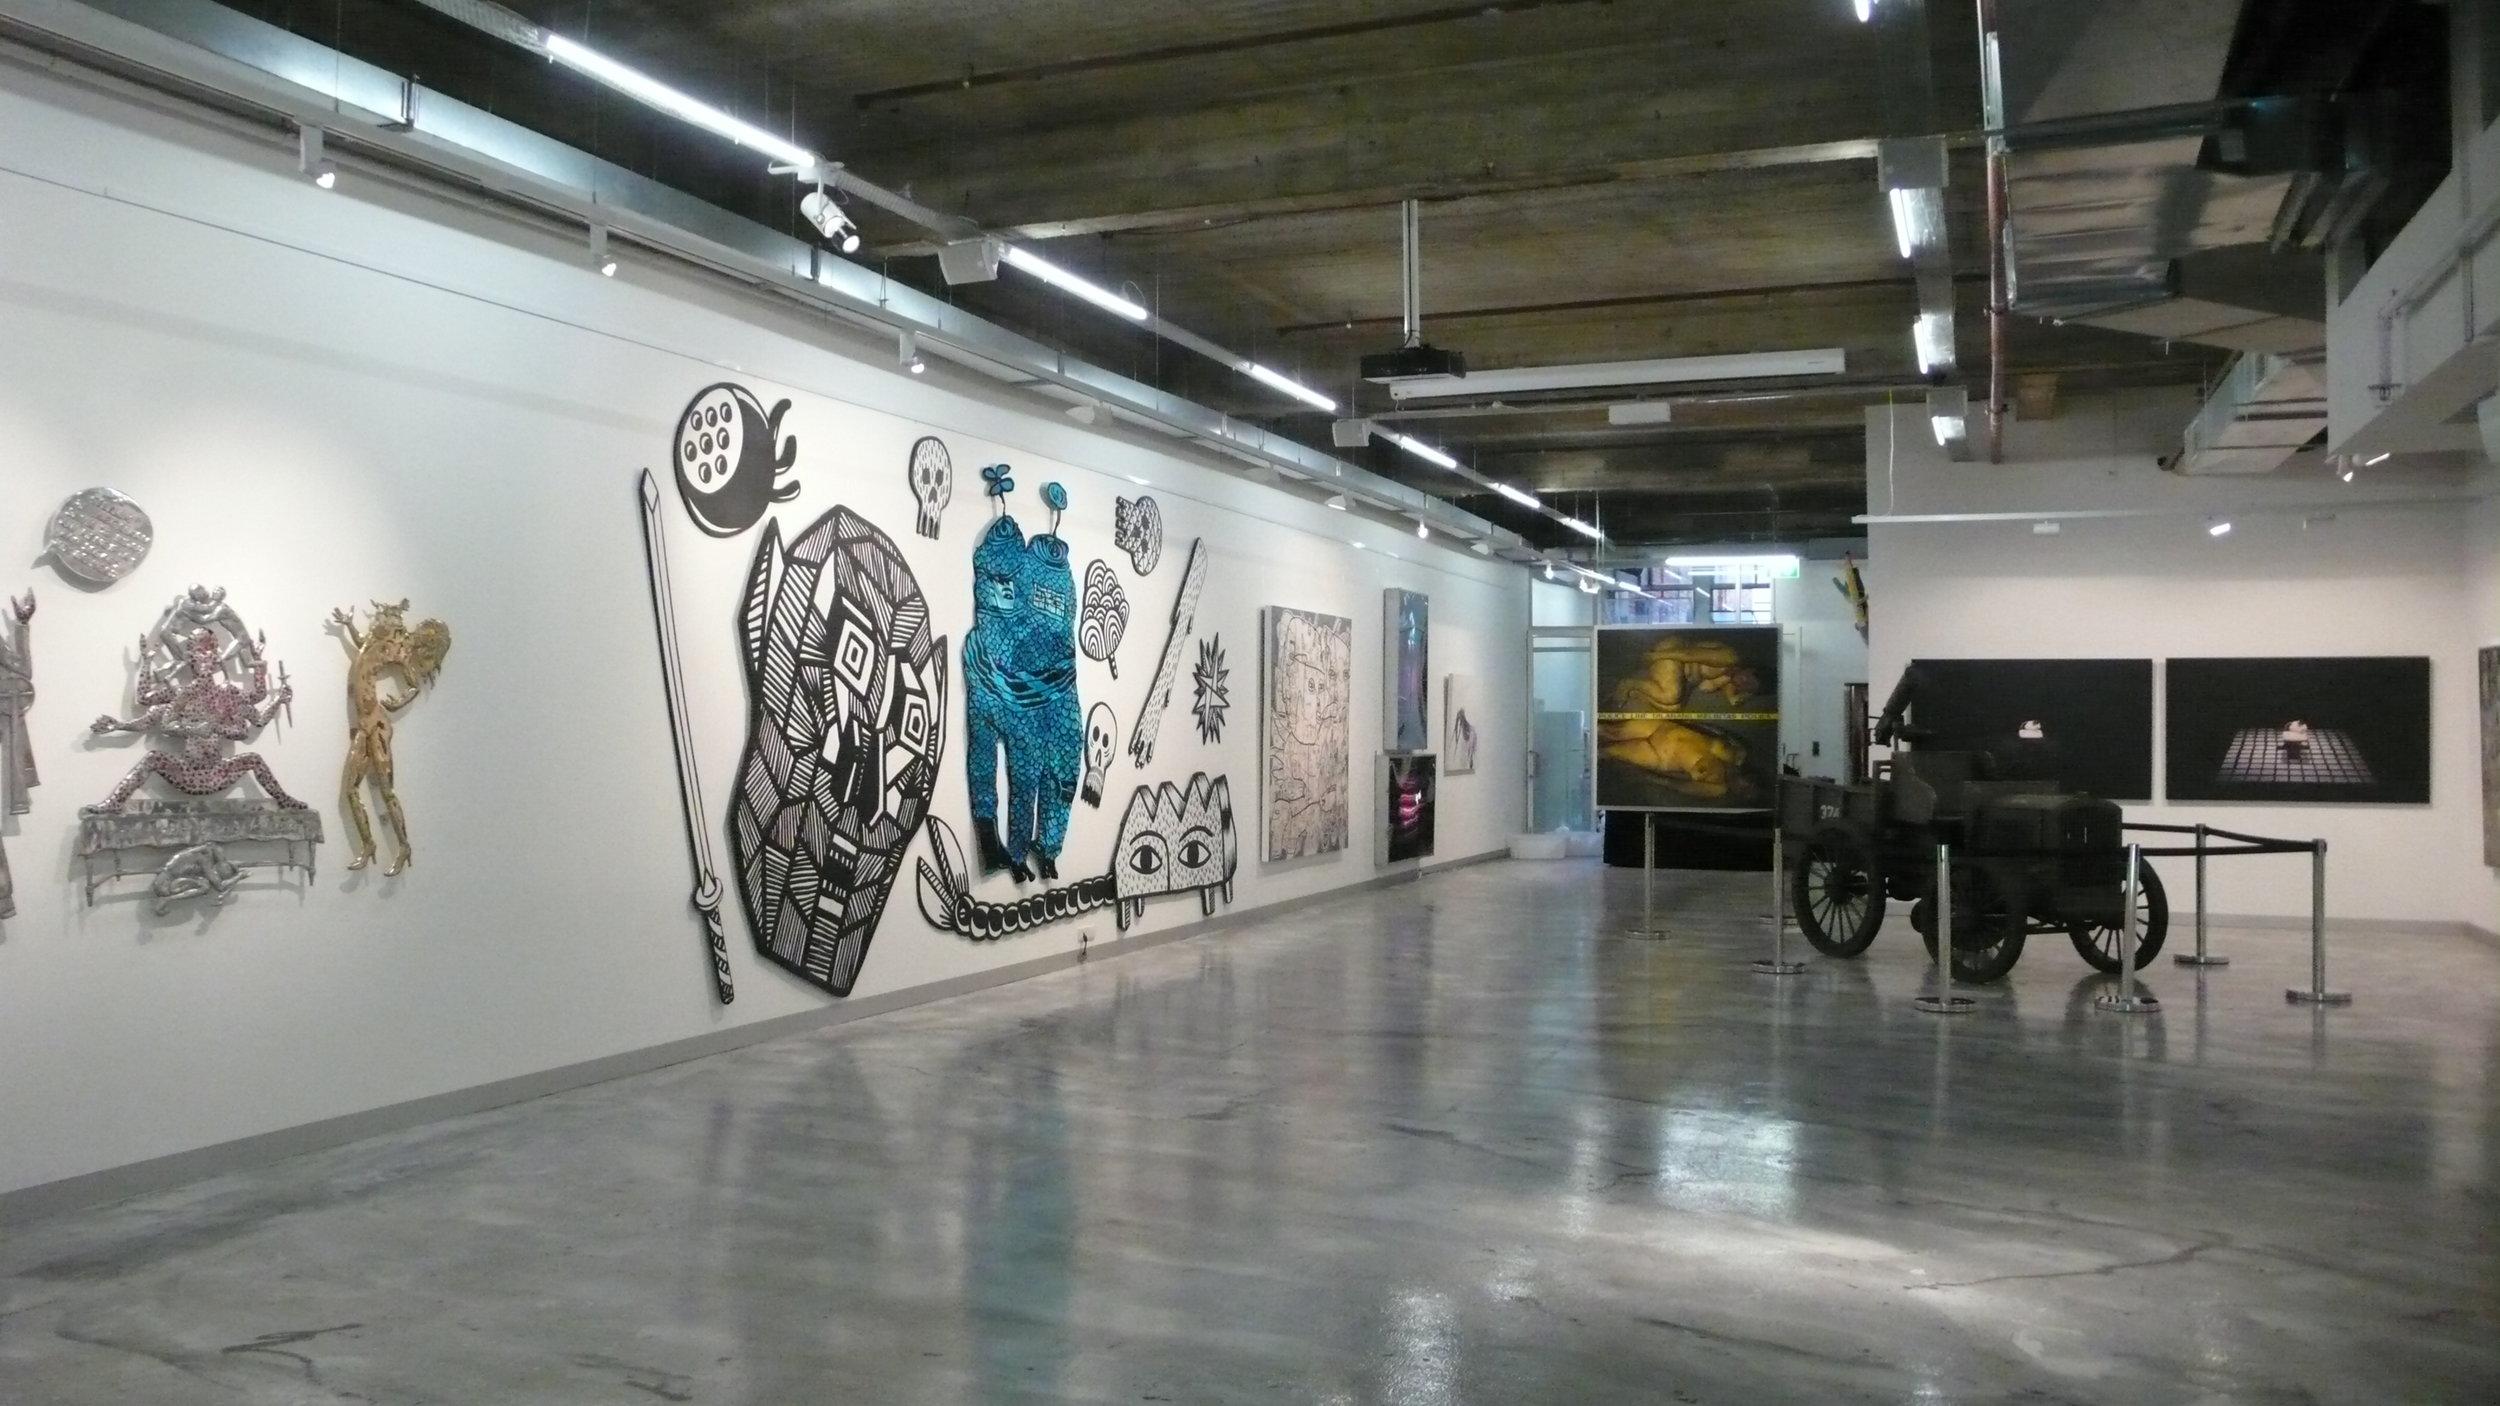 4_Closing the Gap, MiFA Gallery, Melbourne, 2011_3.JPG